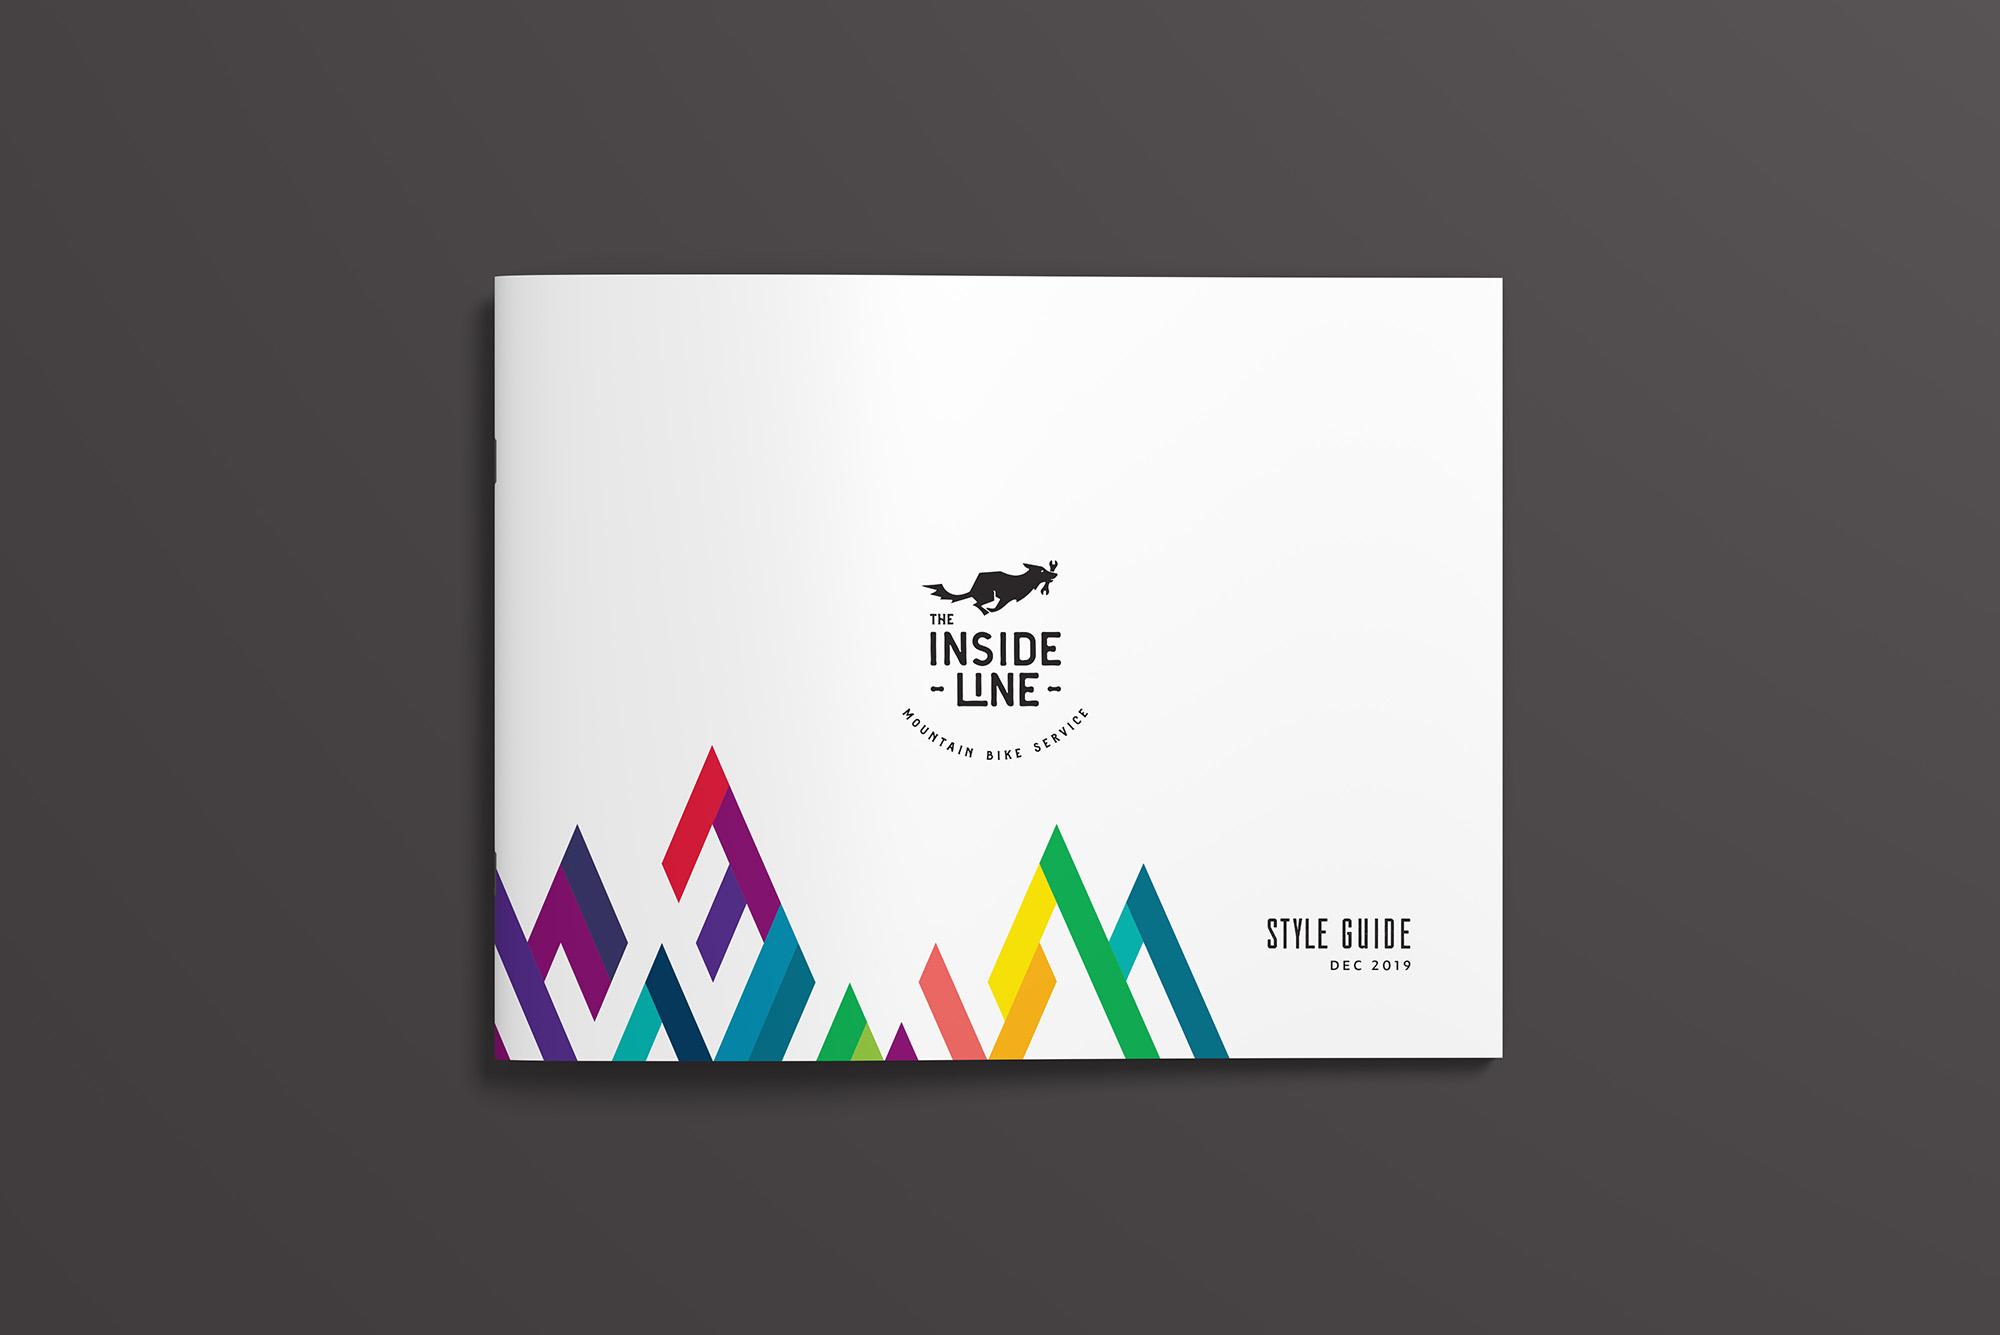 Style Guide Cover Design